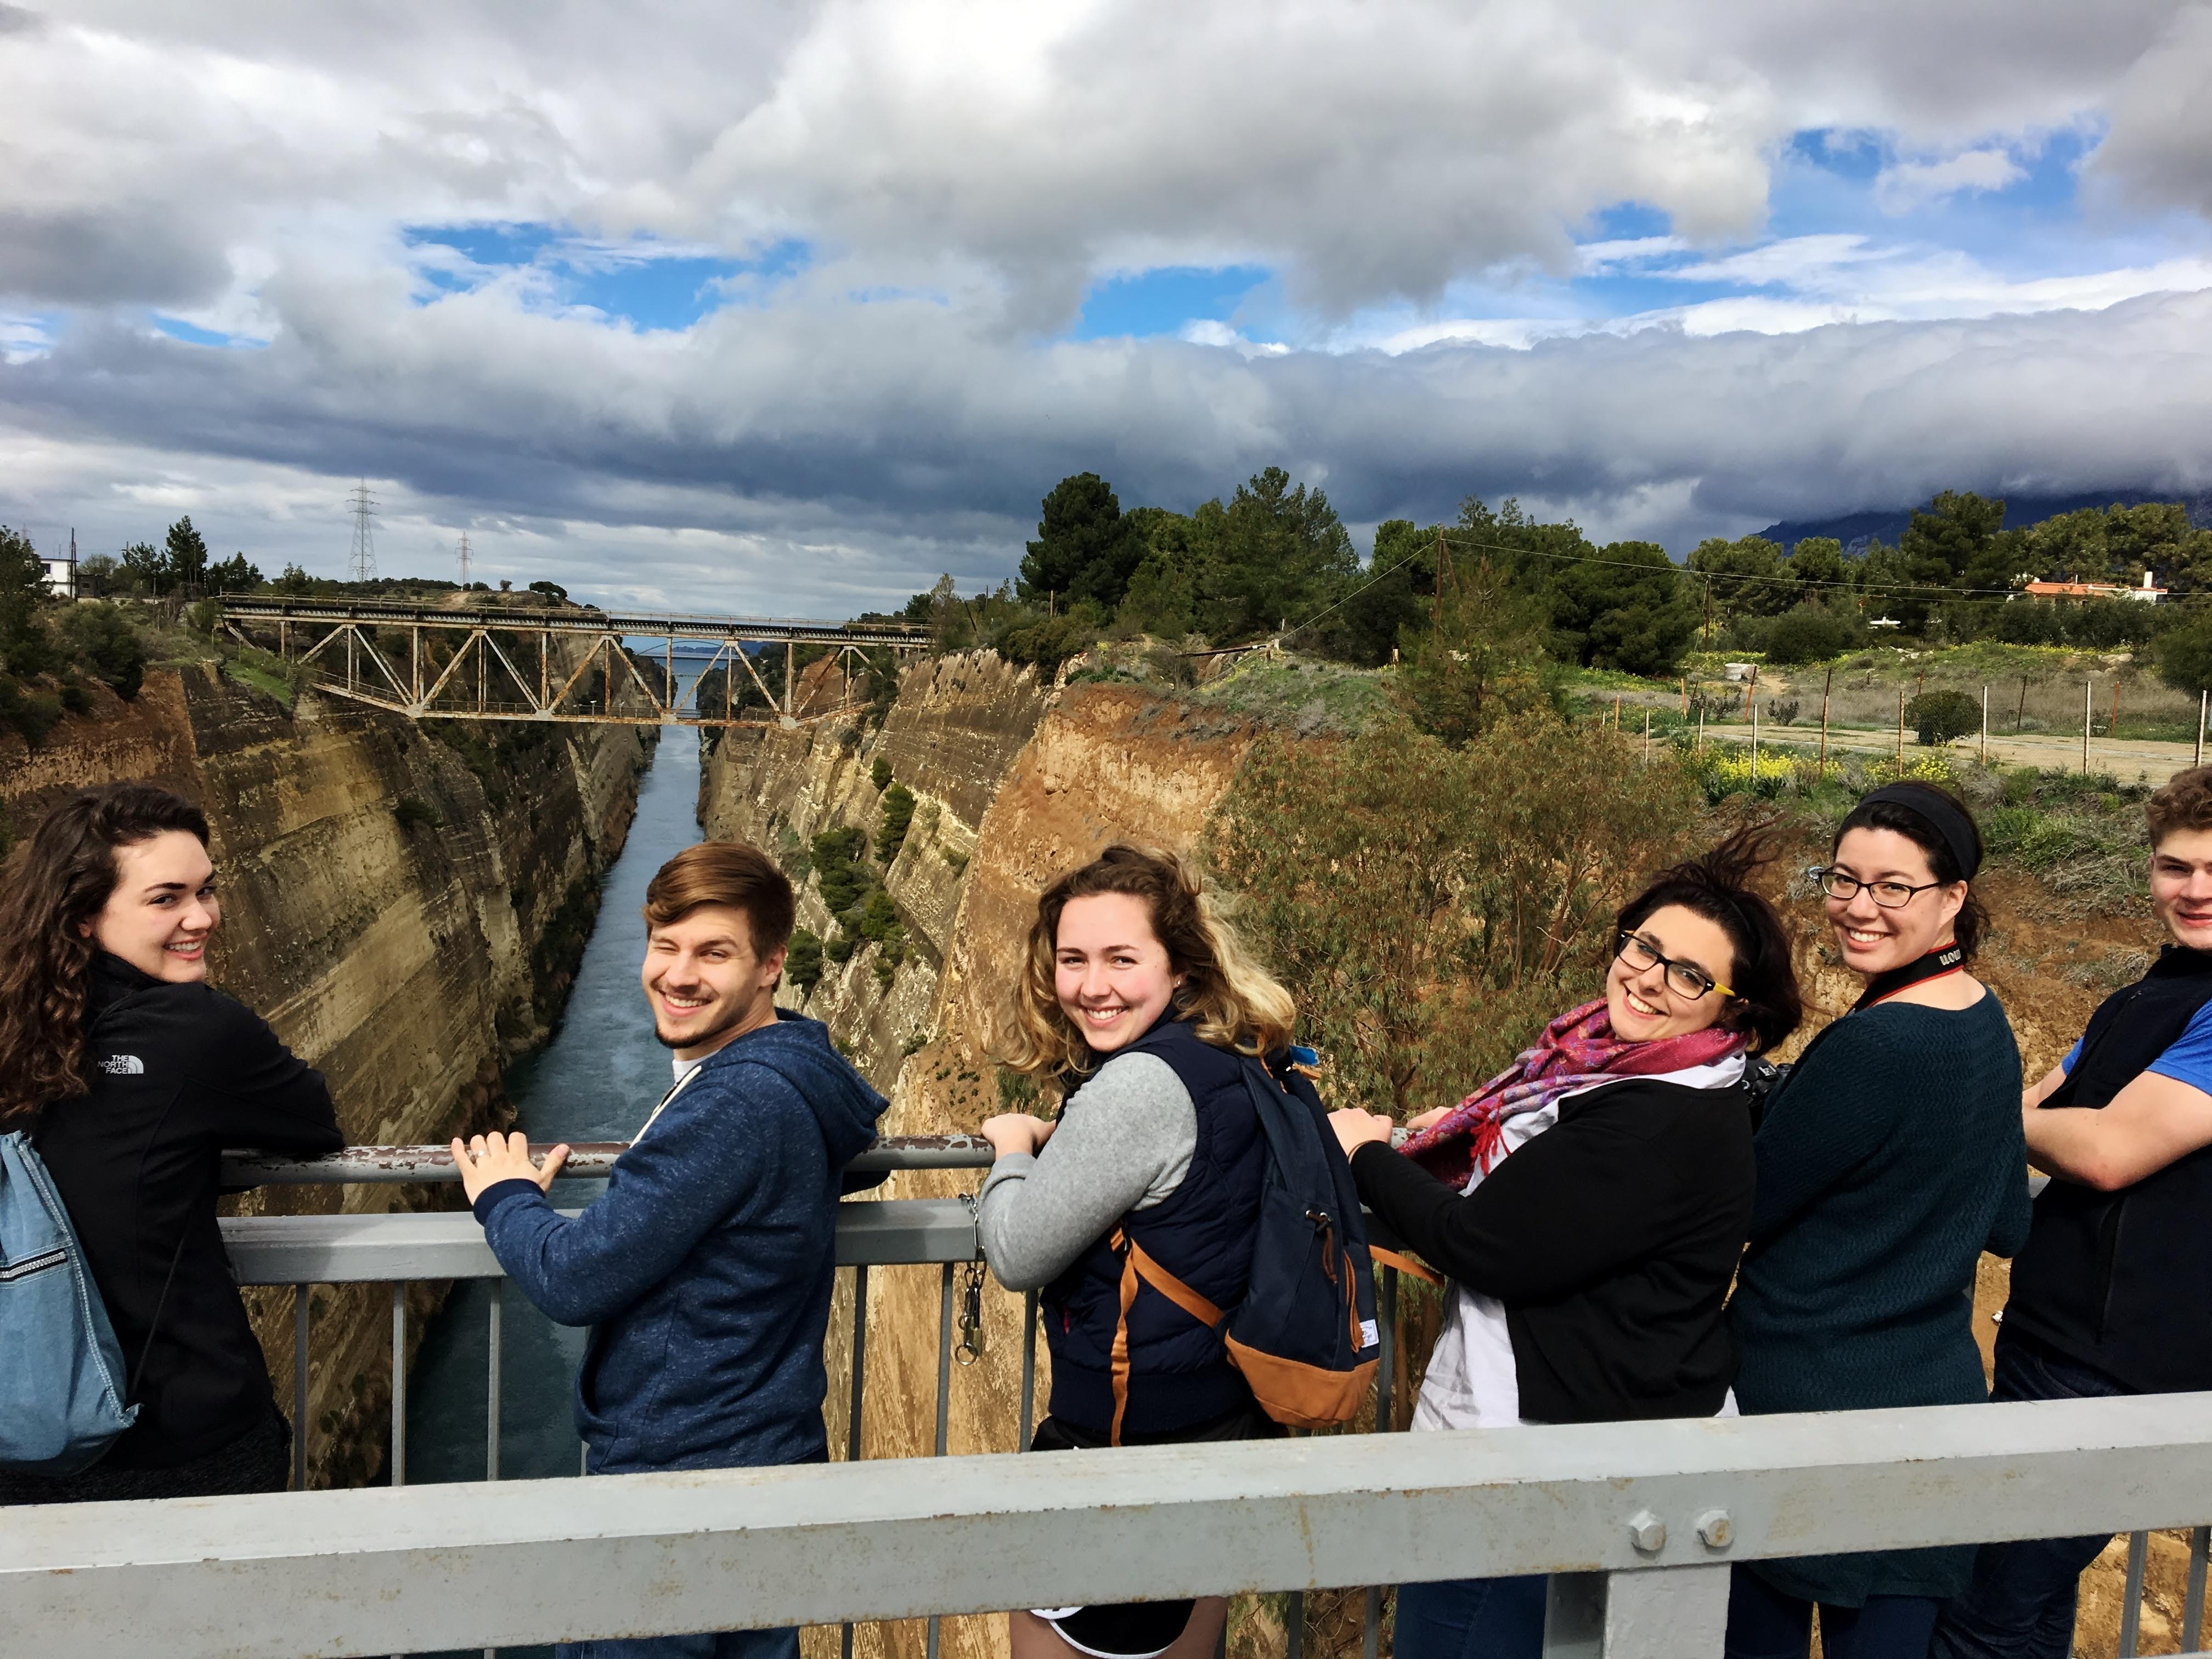 Patrick Henry College Greece spring break missions trip